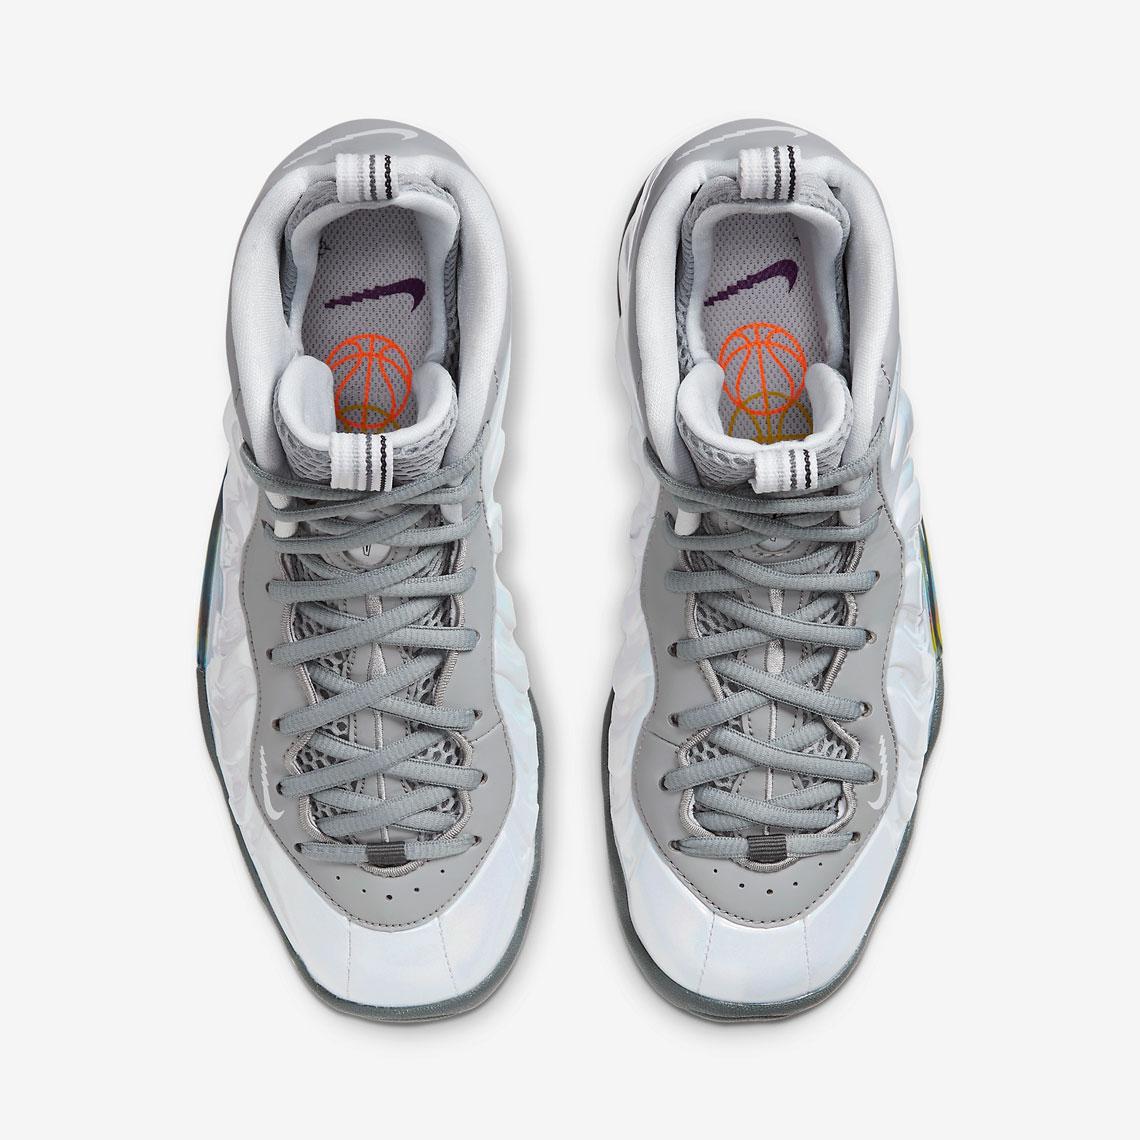 Nike Air Foamposite One XX Dark Neon Royal Blue White ...